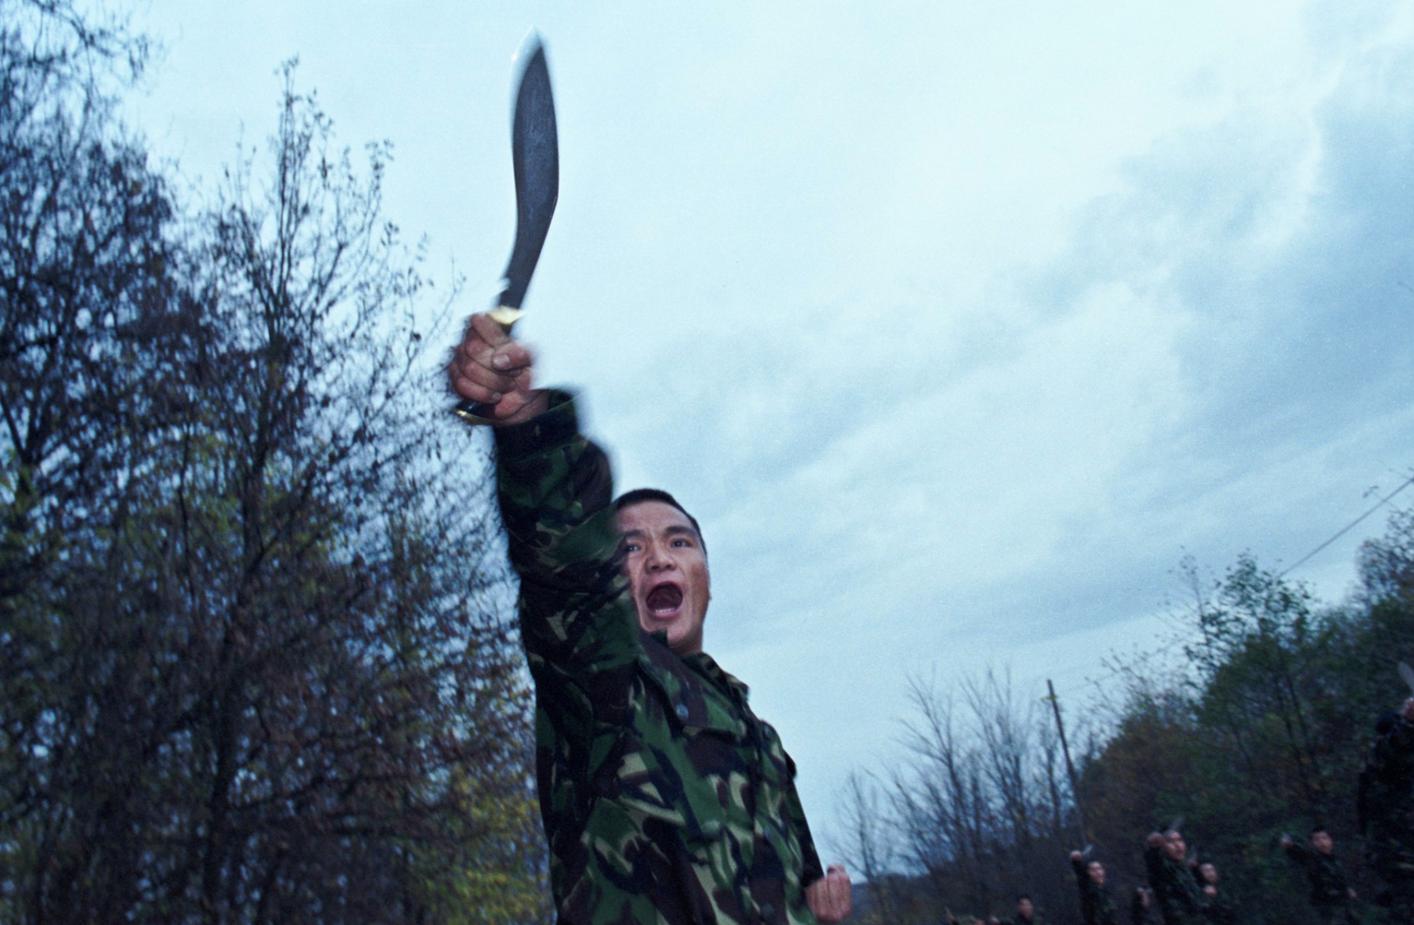 Combat_training_with_kukri__Bosnia